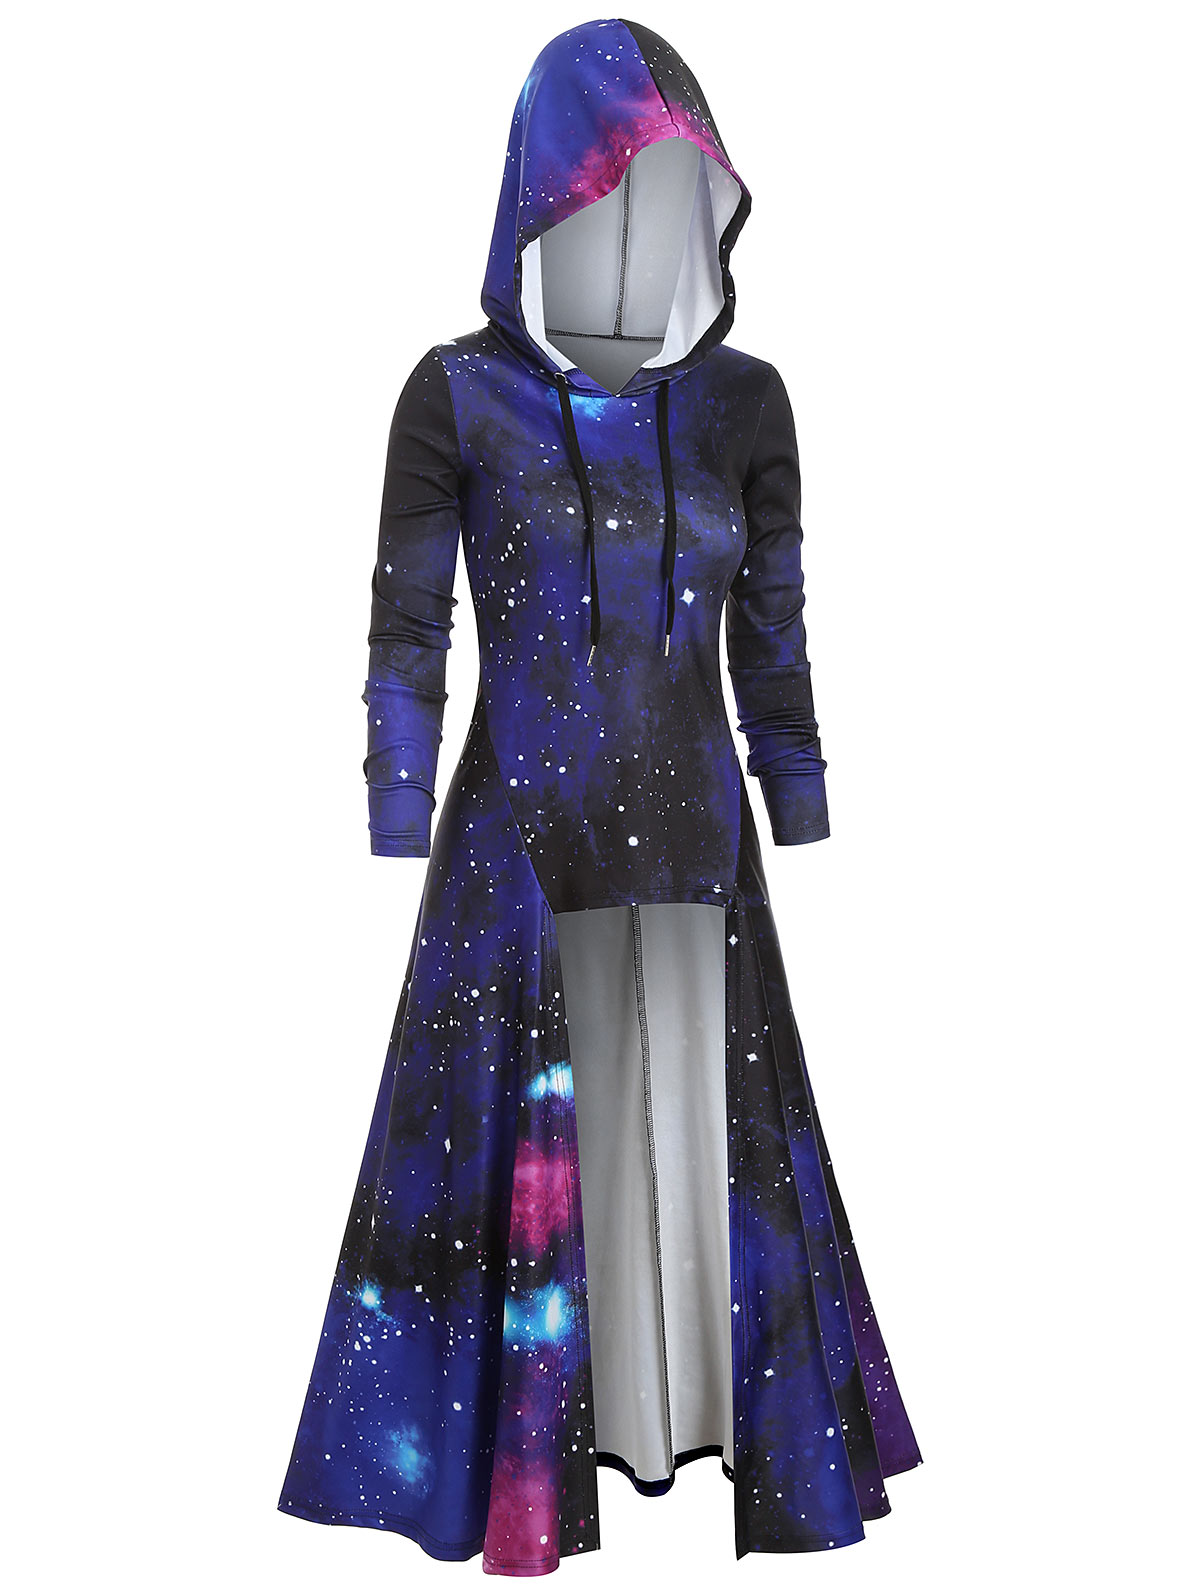 circle dress cross top with hood hoodie fashion rave doof boho womens festival short dress galaxy print hooded with skirt